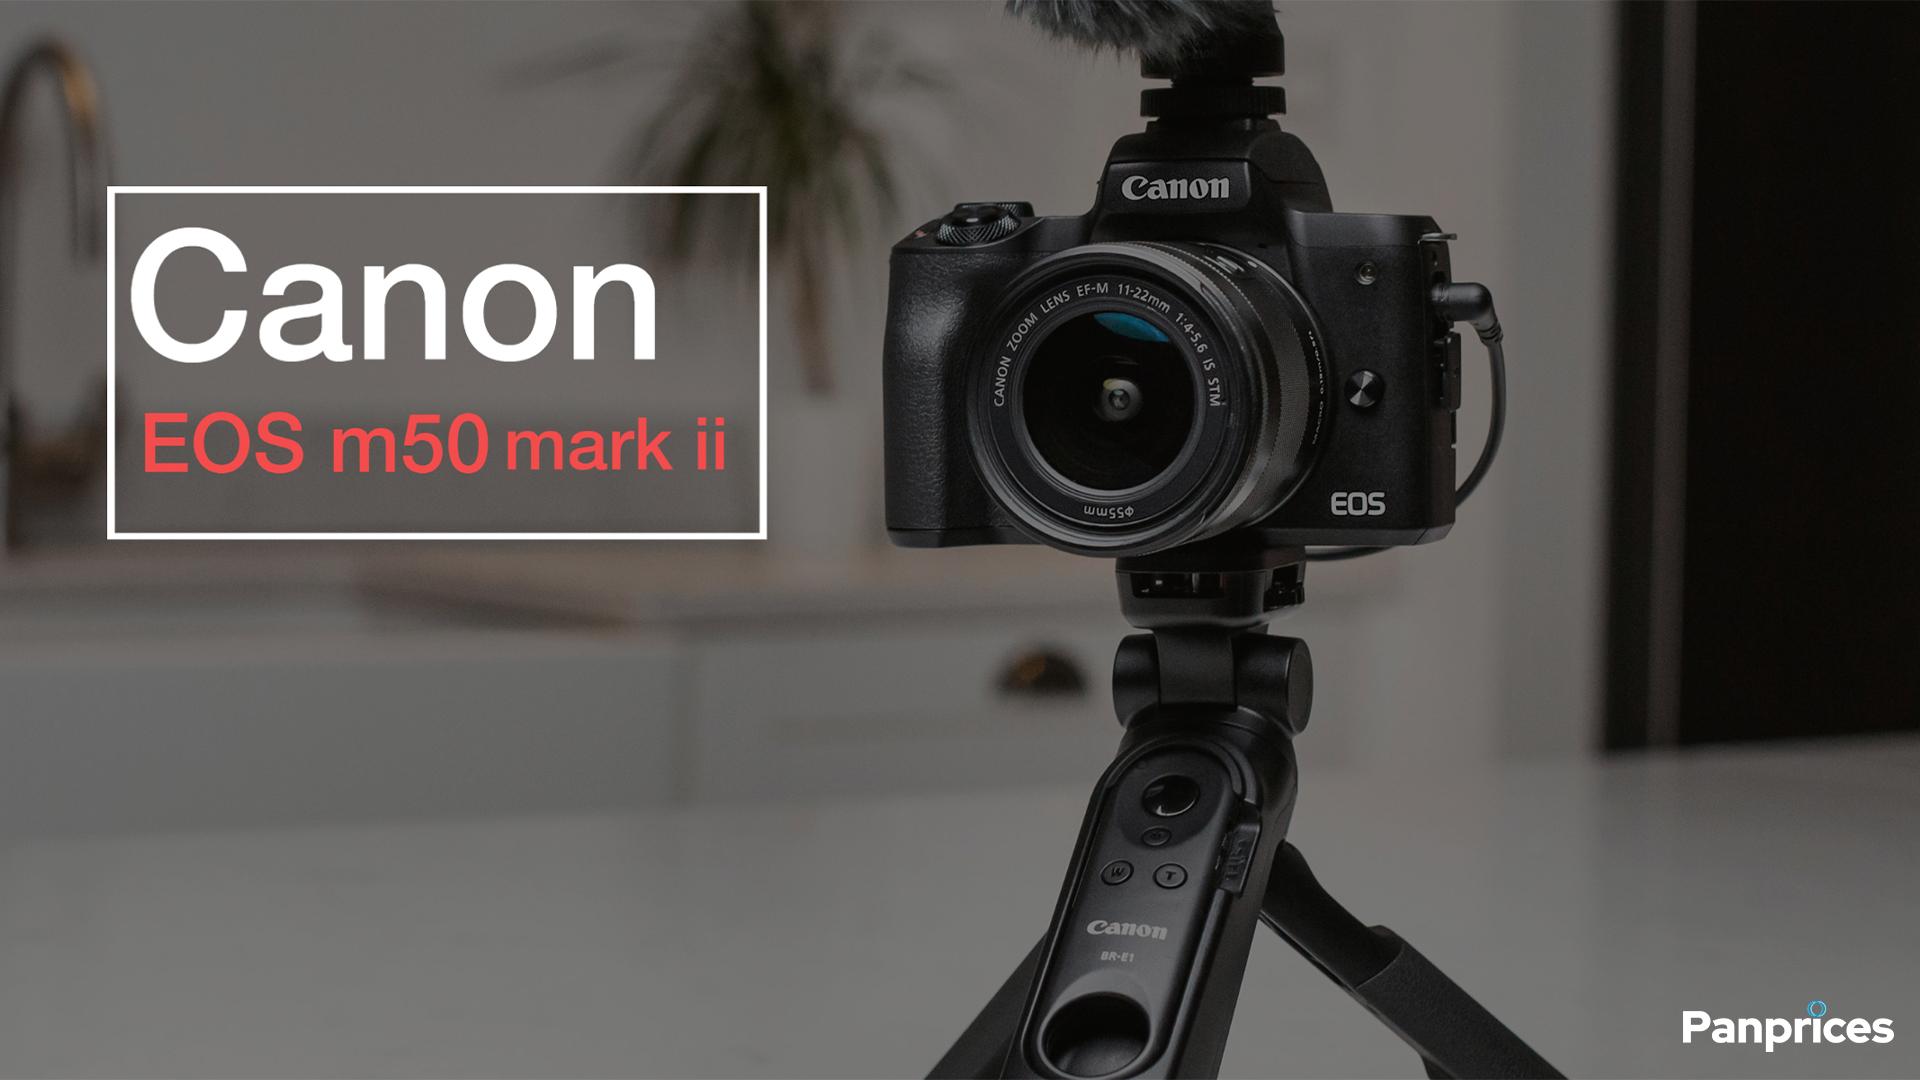 Nya Canon m50 mark ii